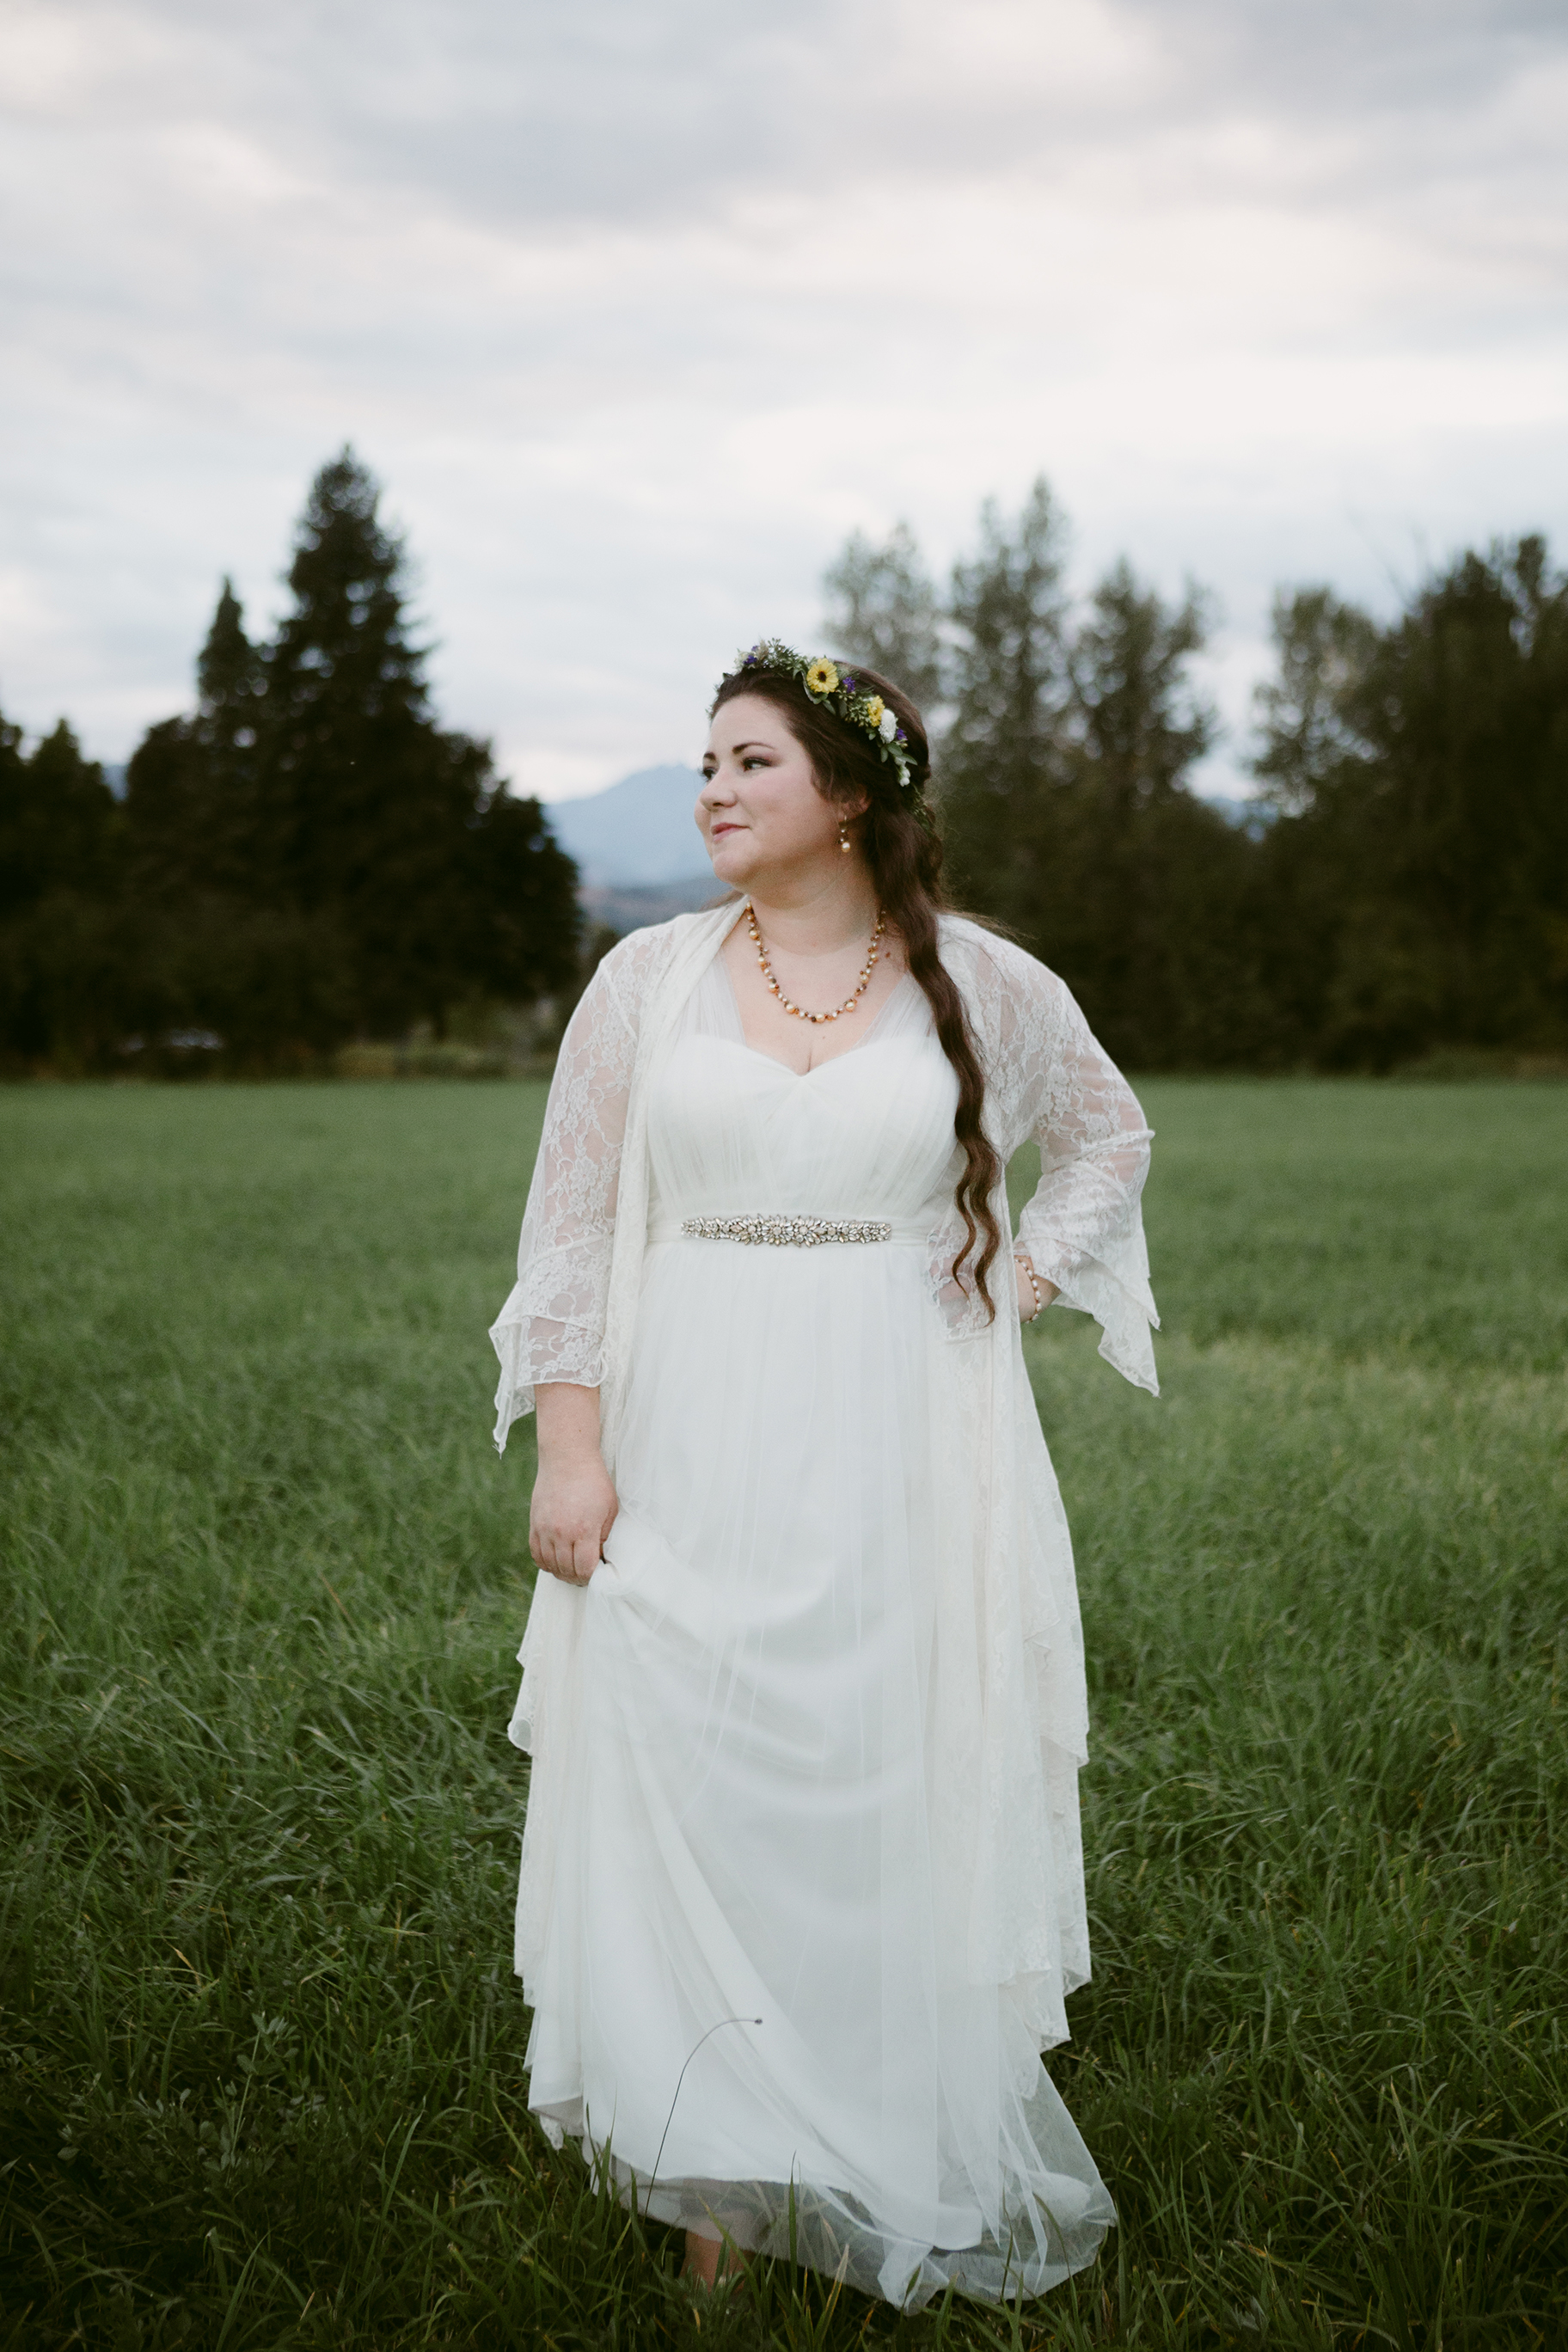 Sunset bride portraits Spring Creek Ranch Winthrop wa